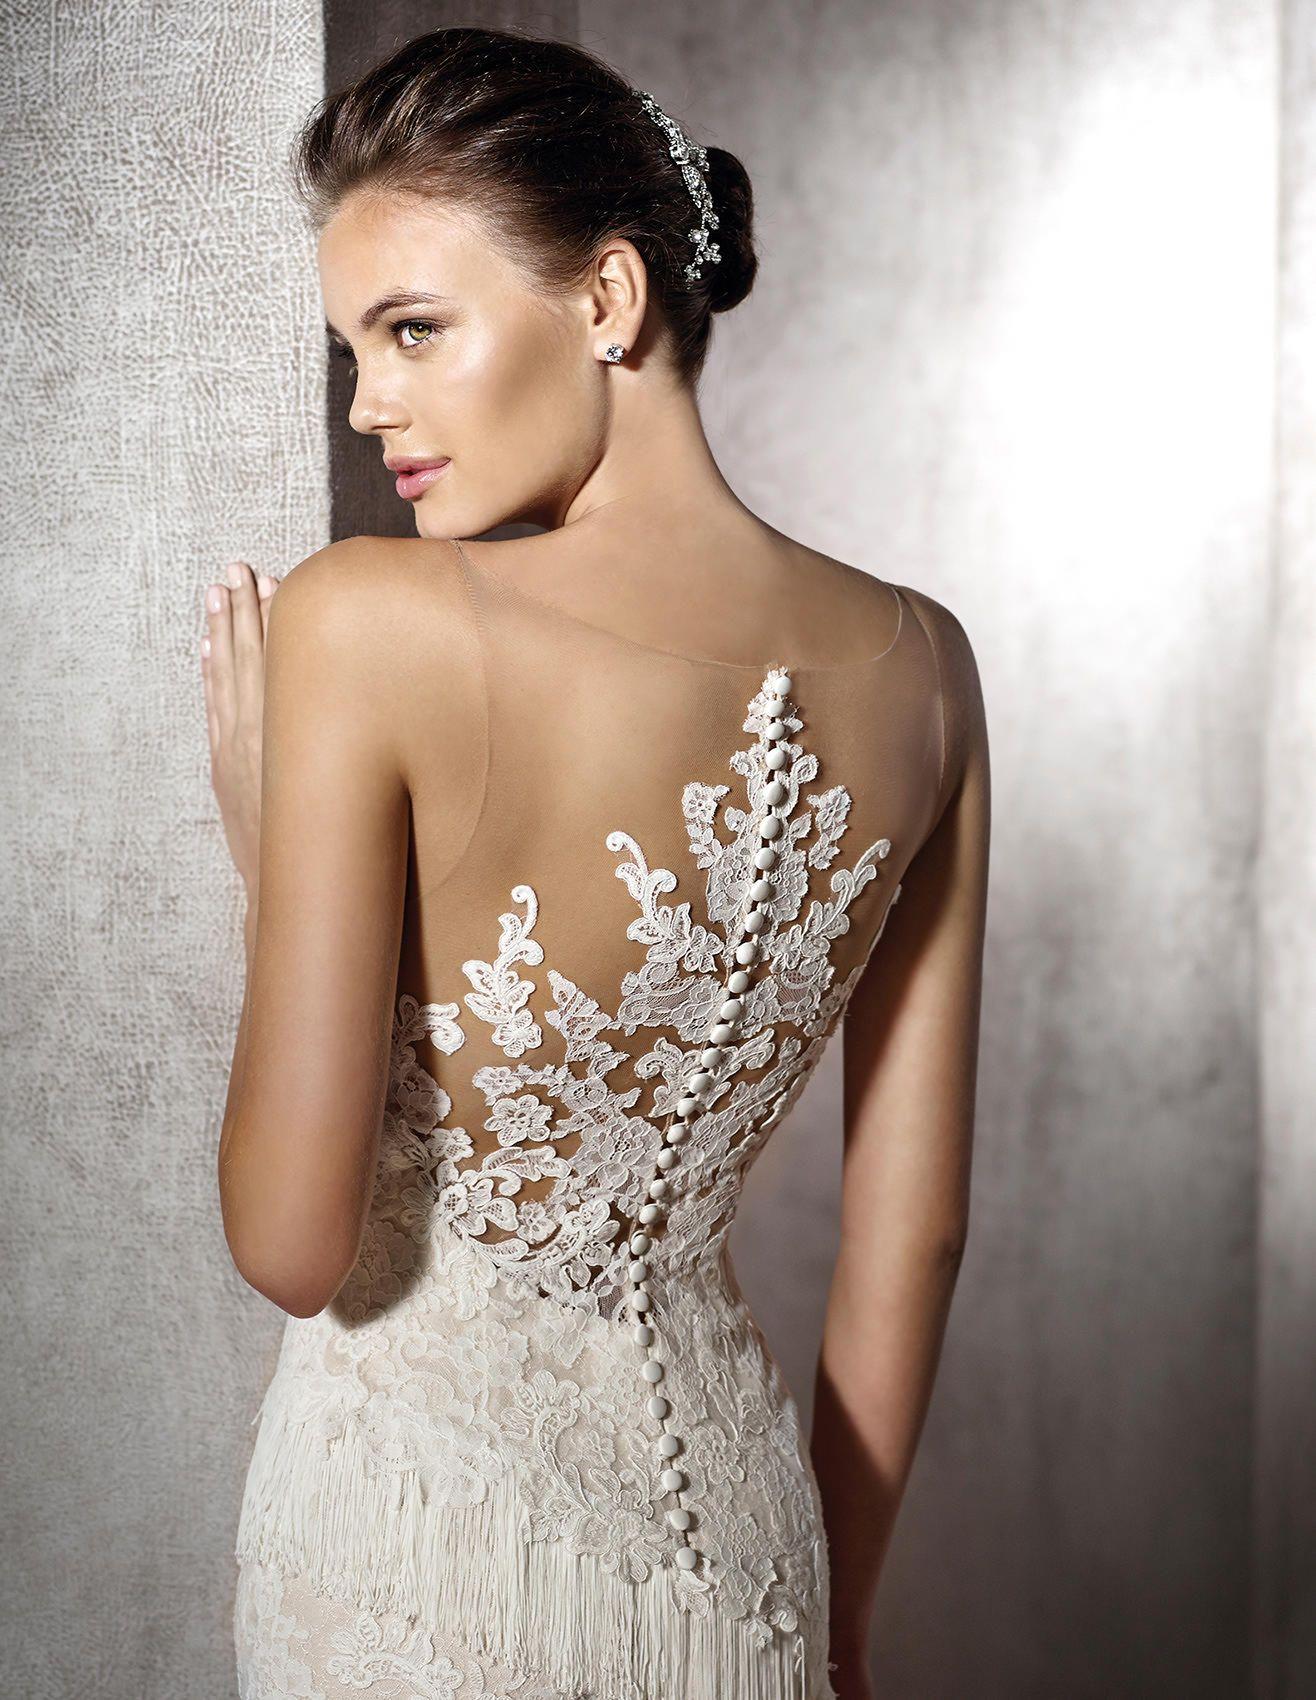 ZENIT - Originelles Brautkleid im Meerjungfrau-Stil | St. Patrick ...